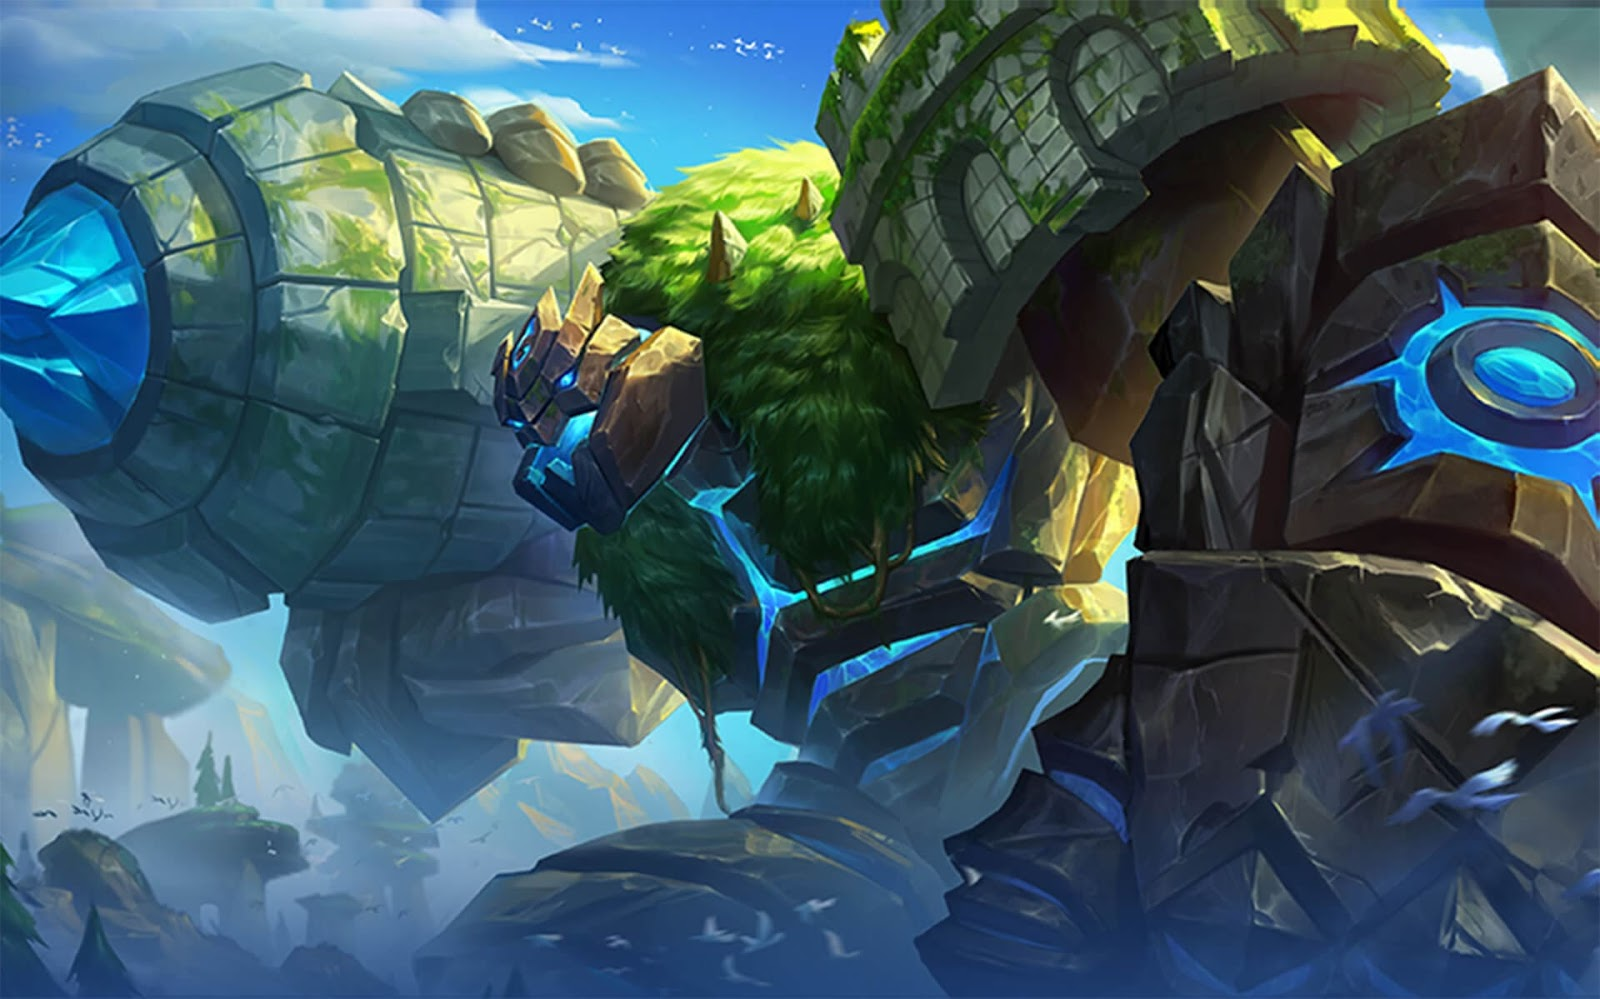 Wallpaper Grock Fortress Titan Skin Mobile Legends HD for PC